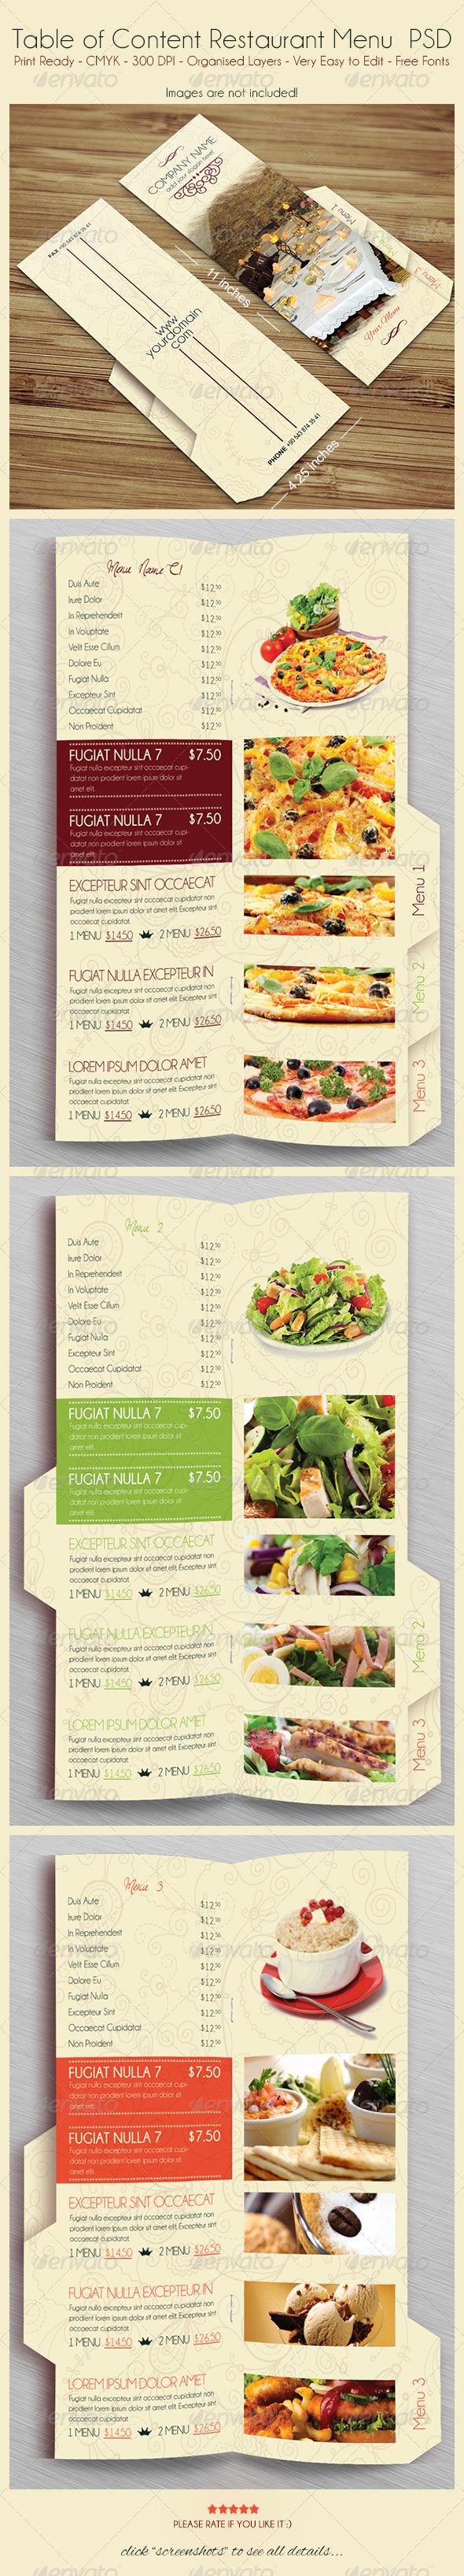 Table of Content Restaurant Menu